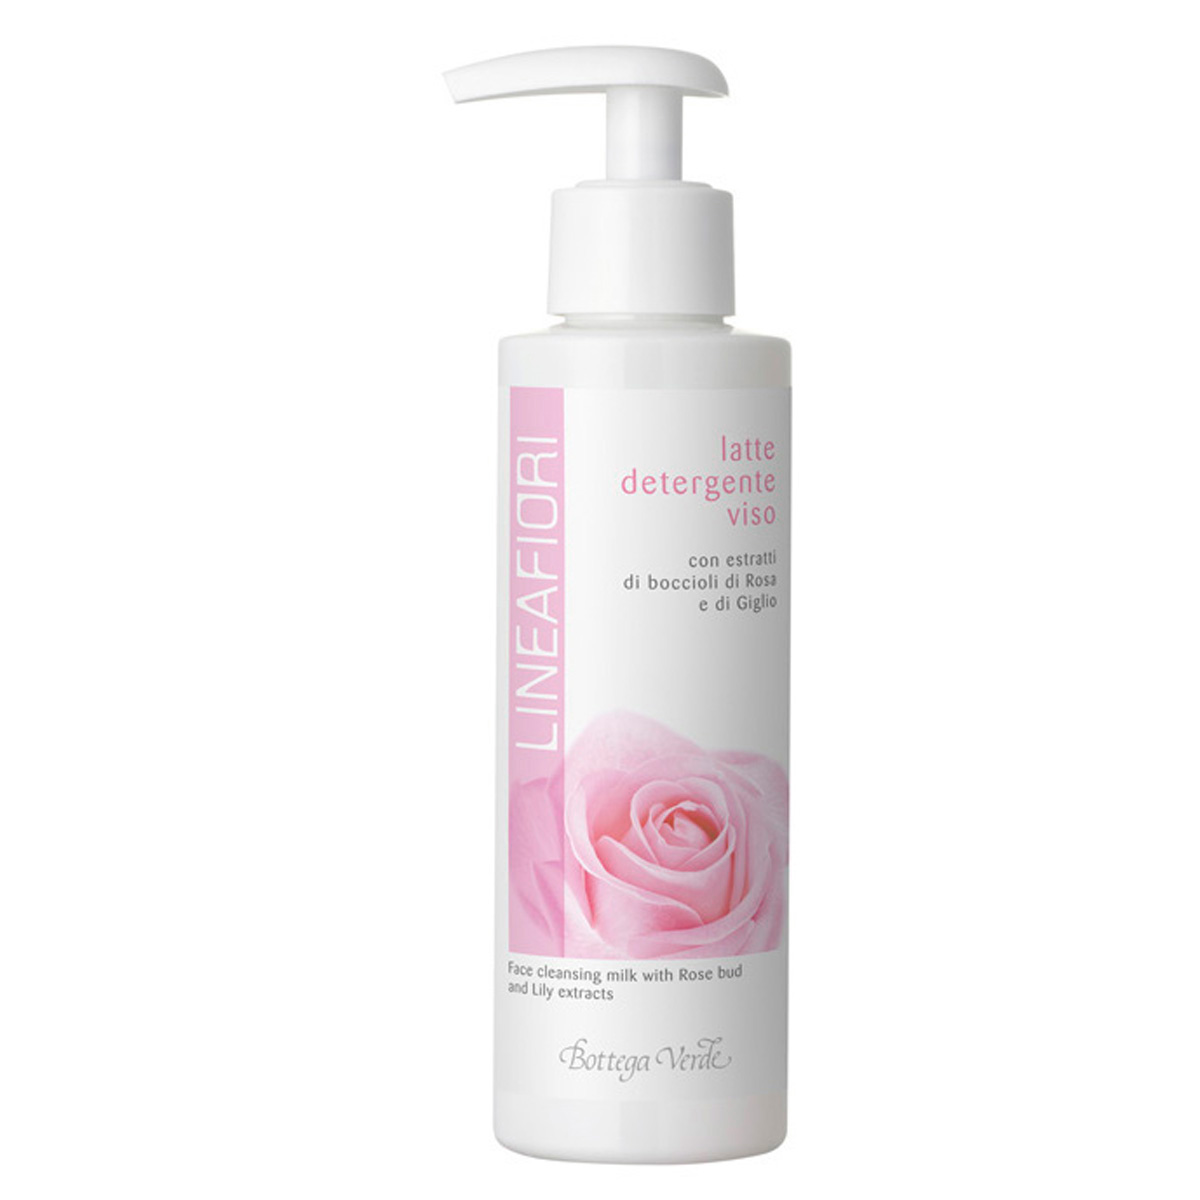 Lapte demachiant pentru fata cu extract din muguri de trandafiri si crini - Lineafiori, 150 ML